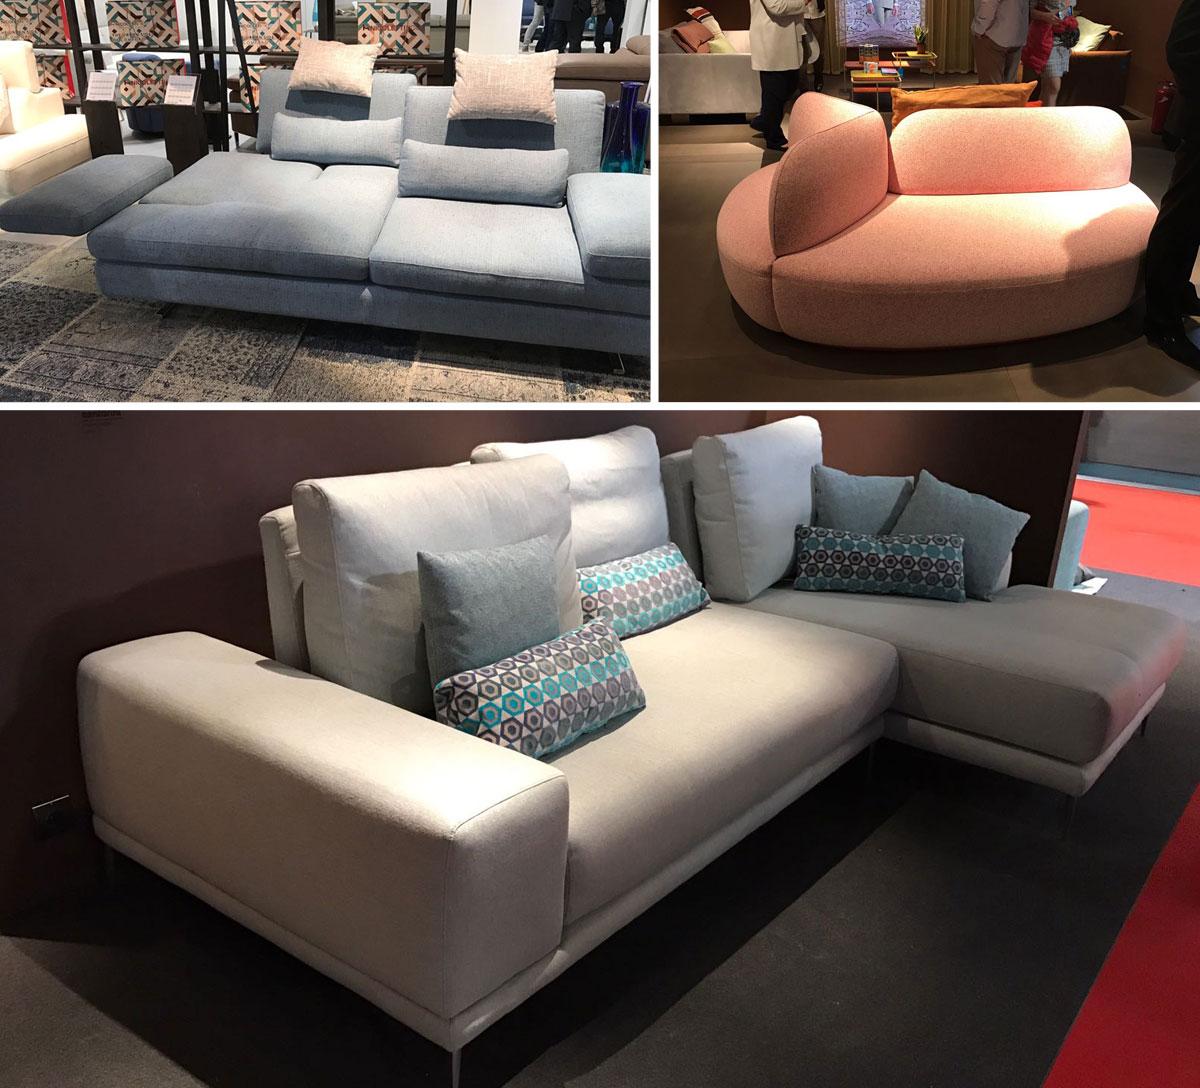 Sal n del mueble mil n 2017 interley interiores - Muebles del salon ...